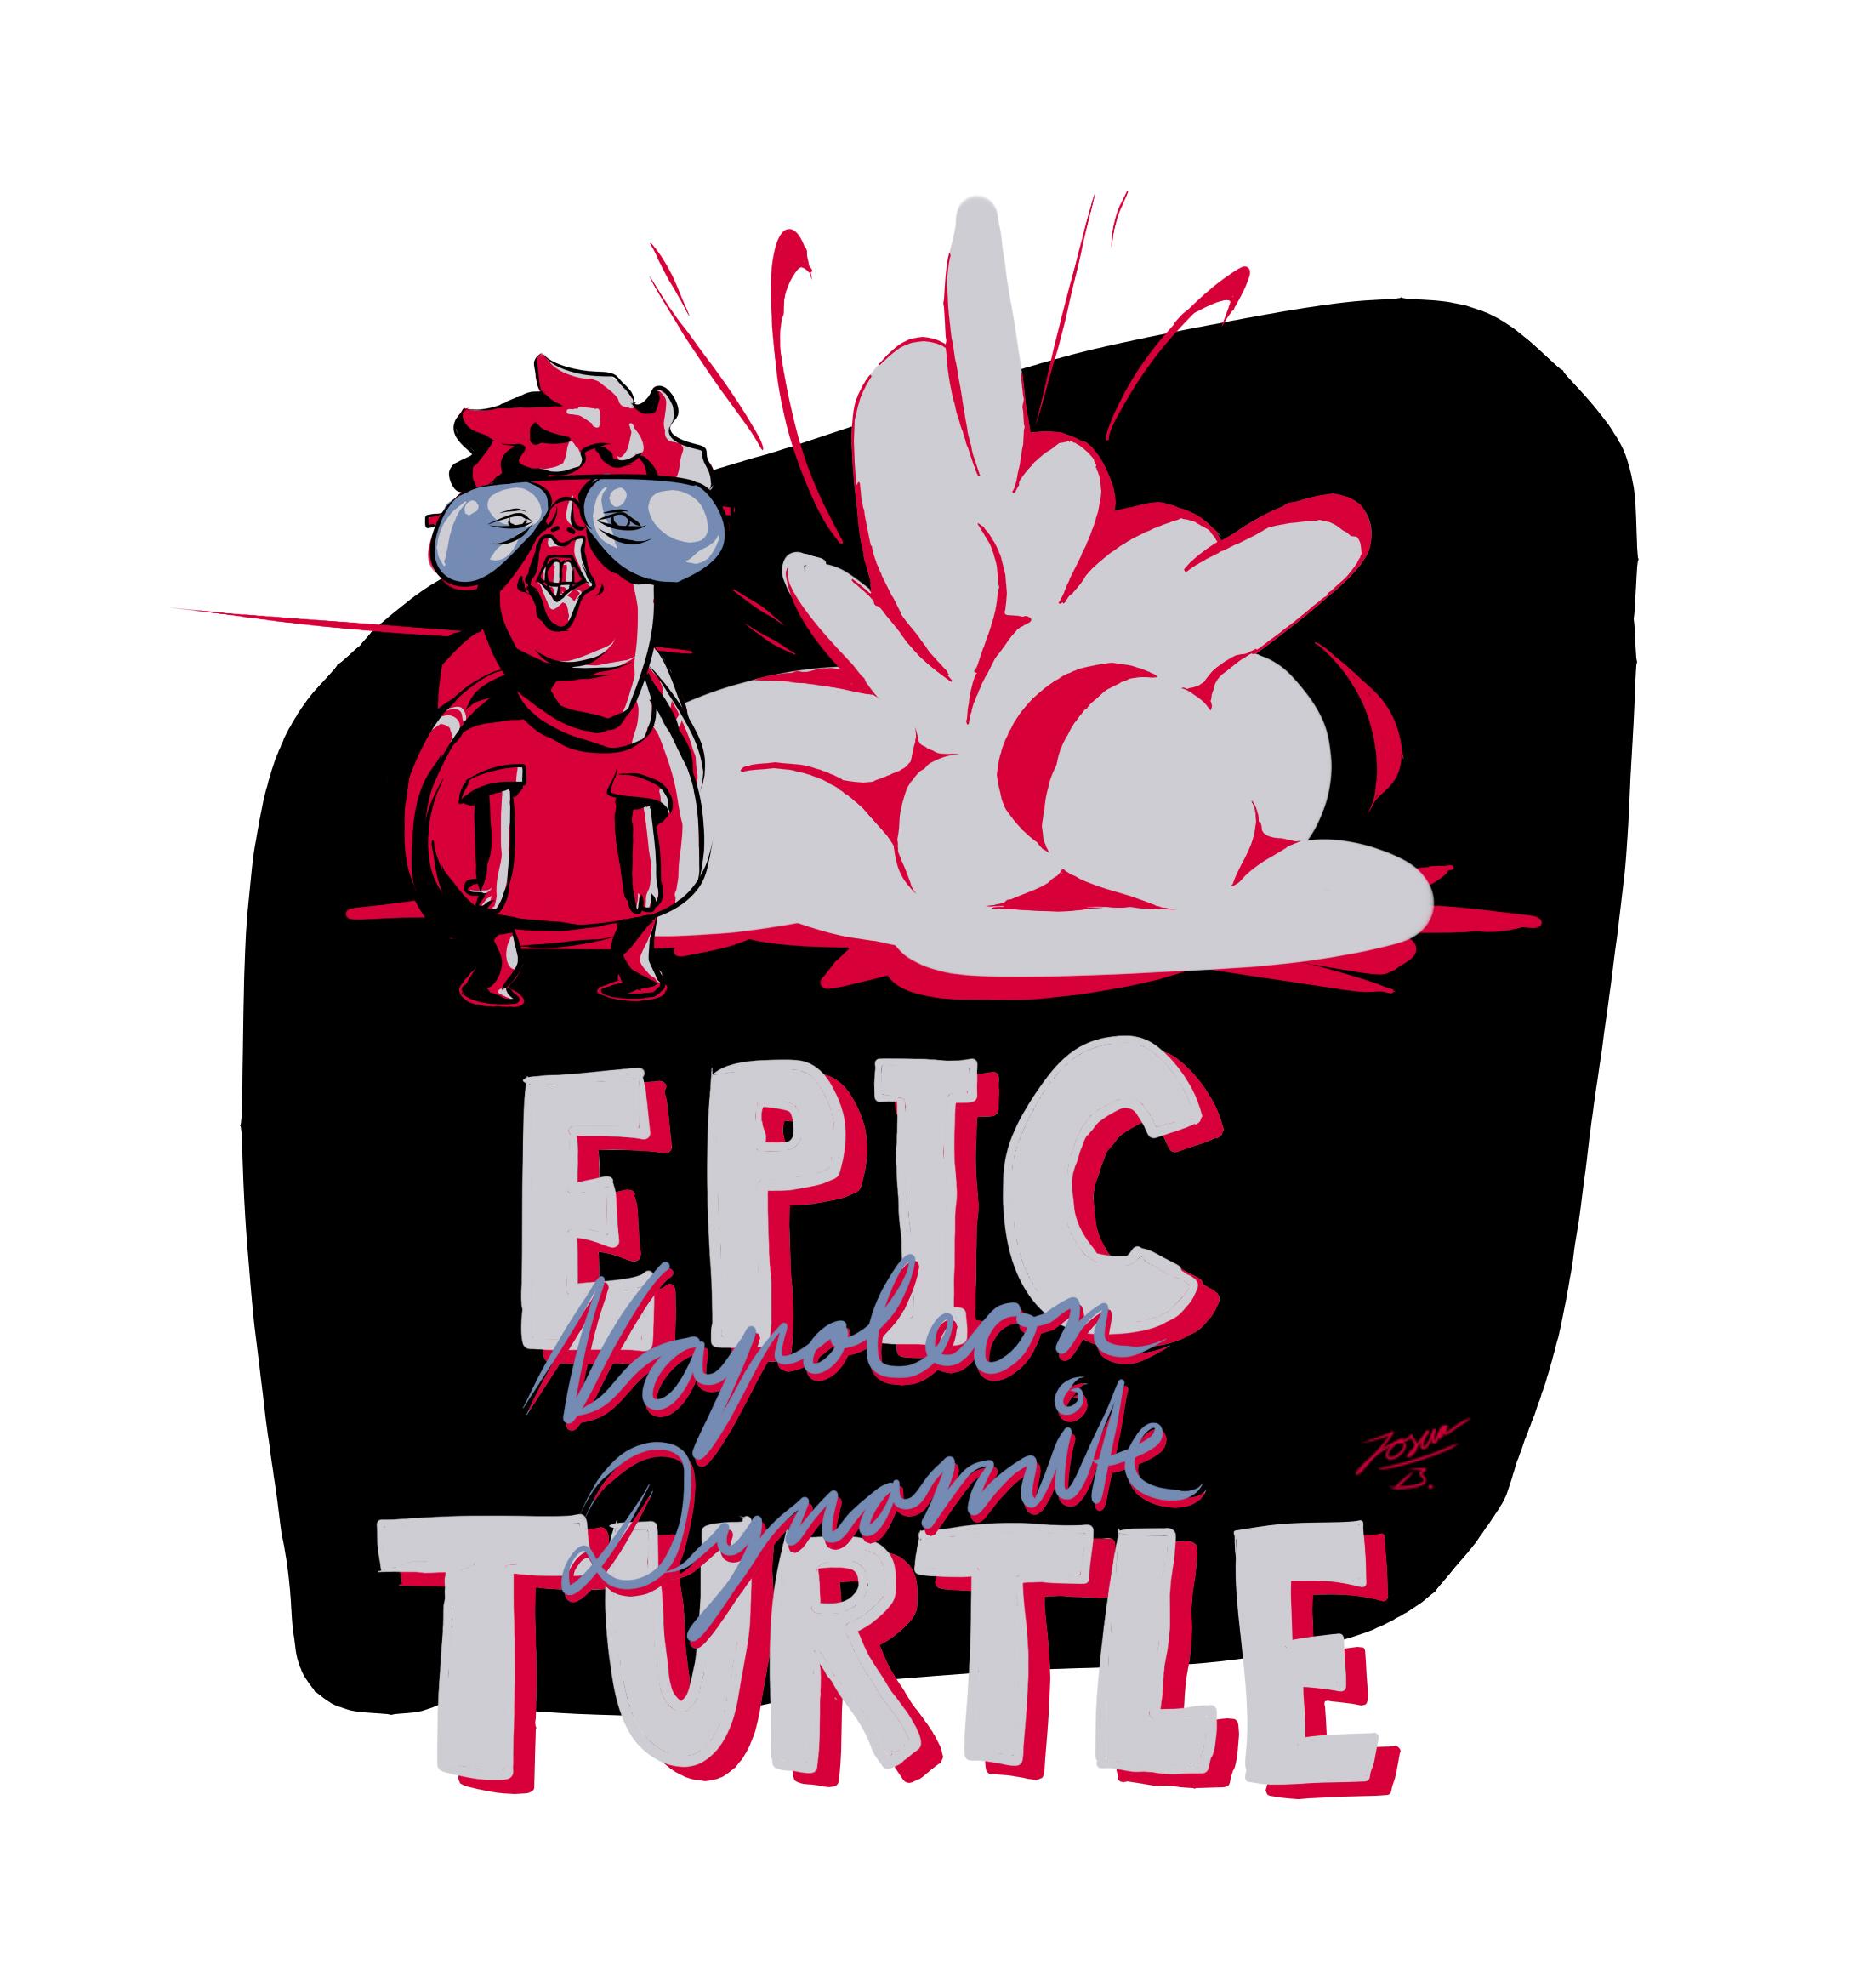 Epic Turtle